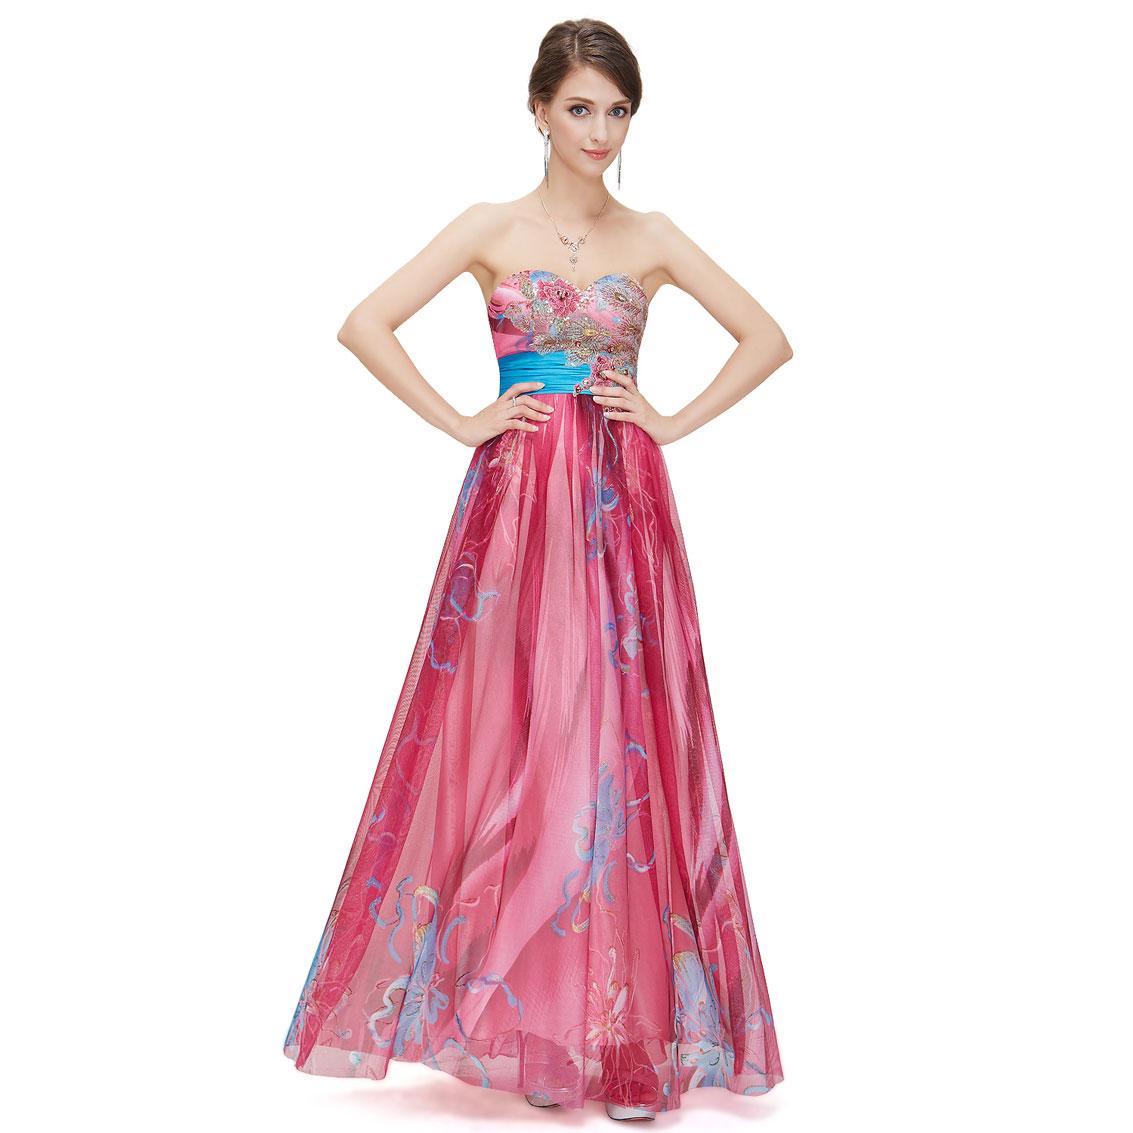 Ever-Pretty Ever Pretty Floral Printed Sequins Strapless Empire Line Long Evening Dress 09820 at Sears.com